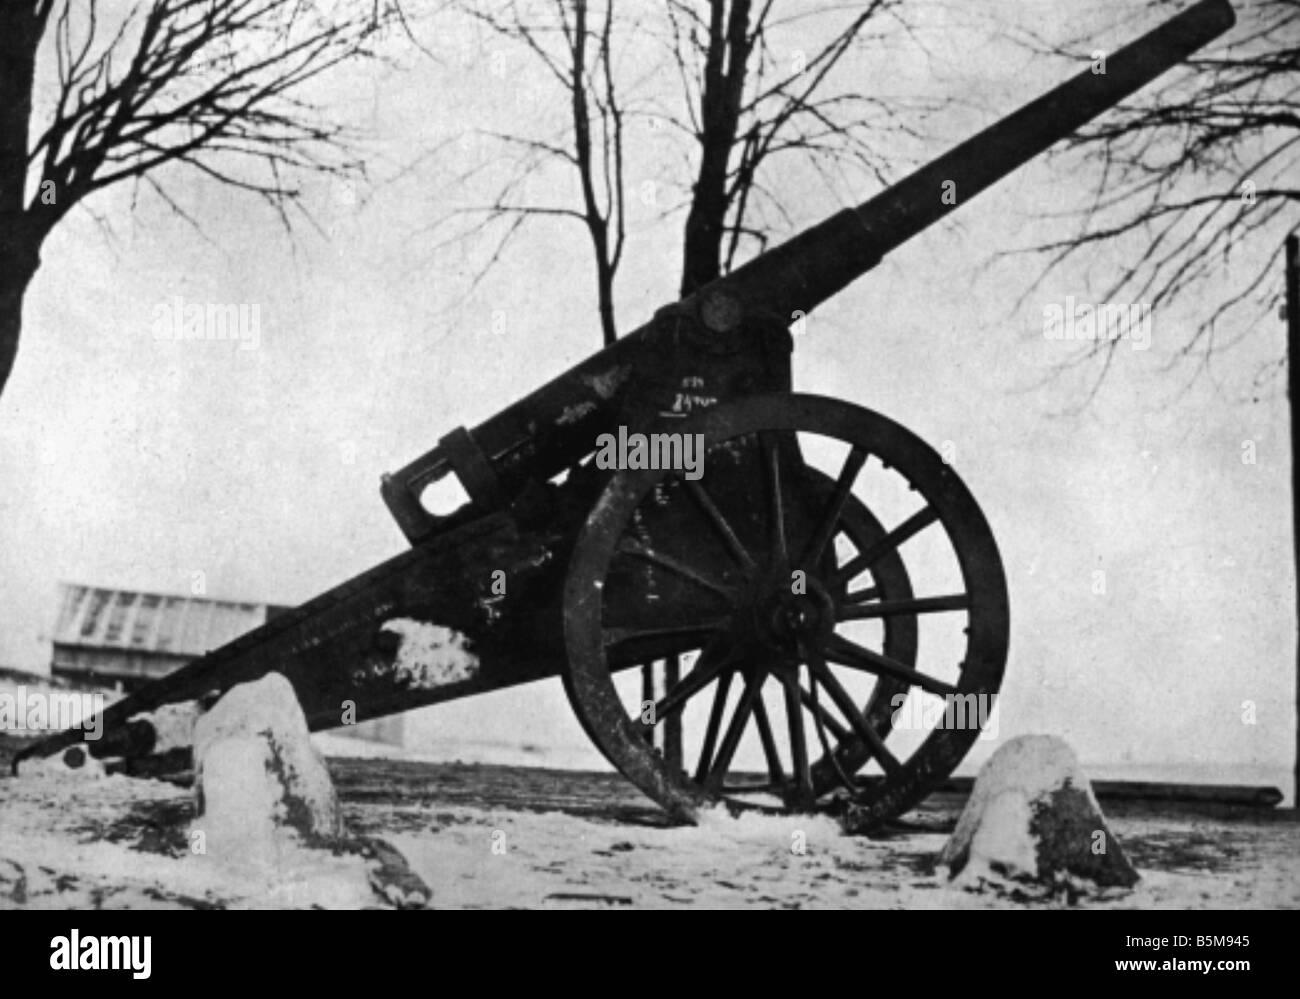 WWI Eastern Front erobert Rus Artillerie Geschichte WWI Eastern Front Captured Russische Artillerie undatierten Stockbild